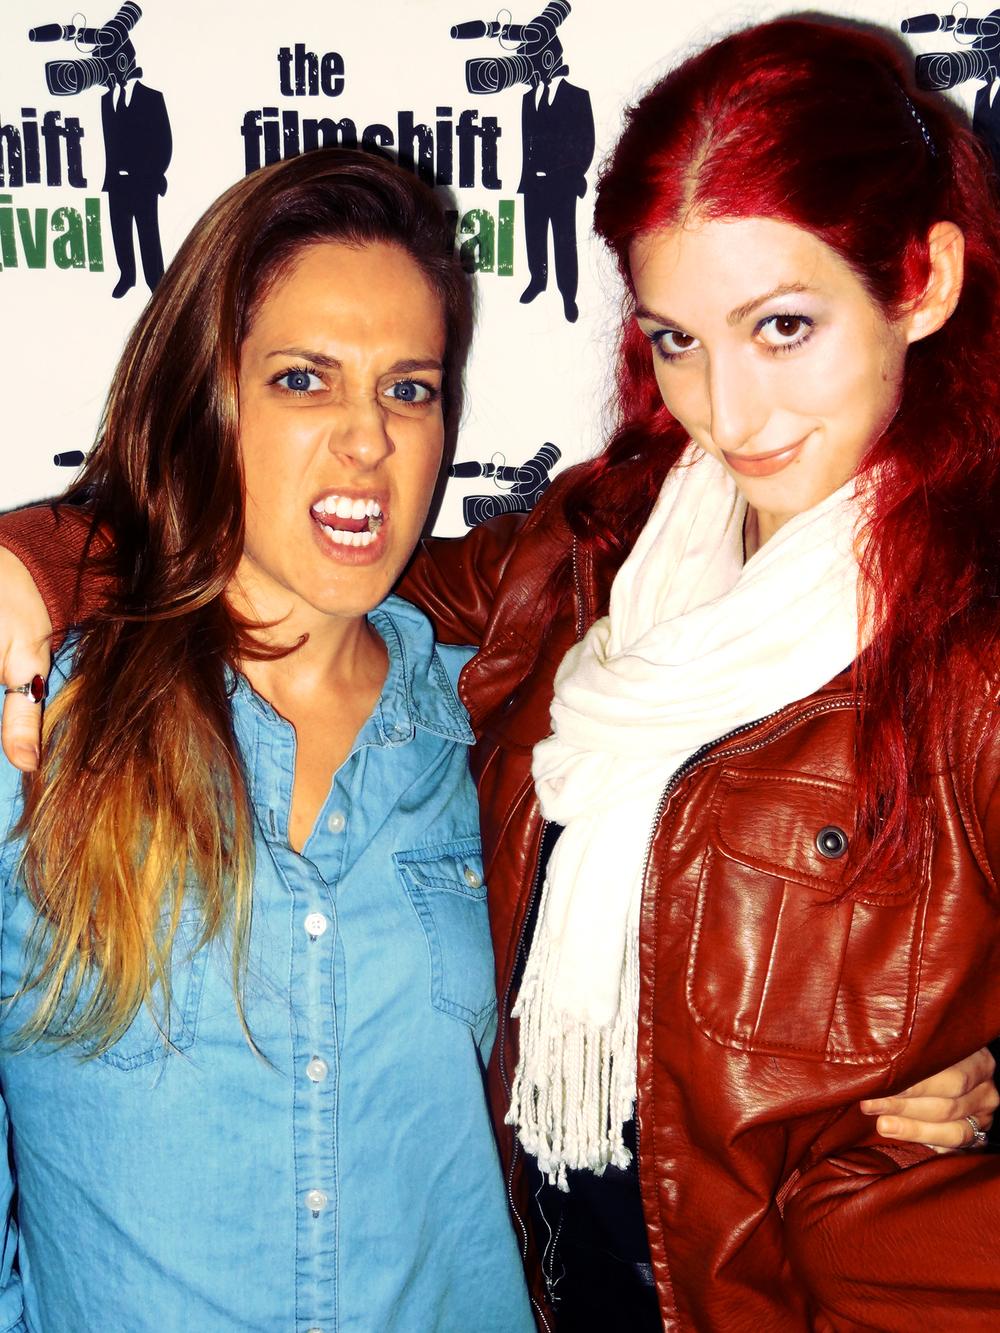 Geena Matuson (@geenamatuson) with Boston-based editor Tara Neves, 2013.